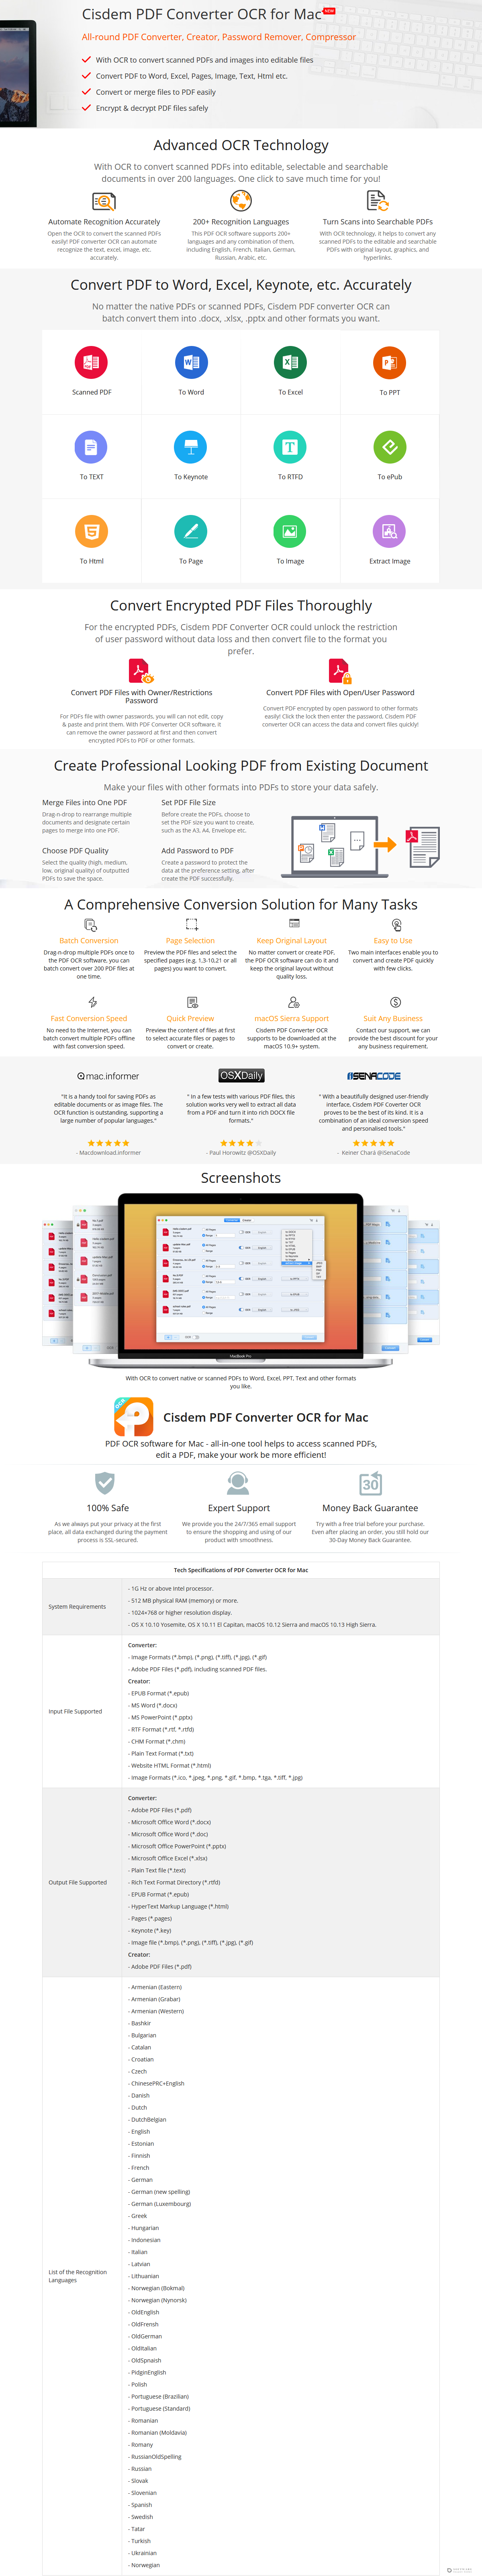 50% Off - Cisdem PDFConverterOCR for Mac Discount Coupon Code